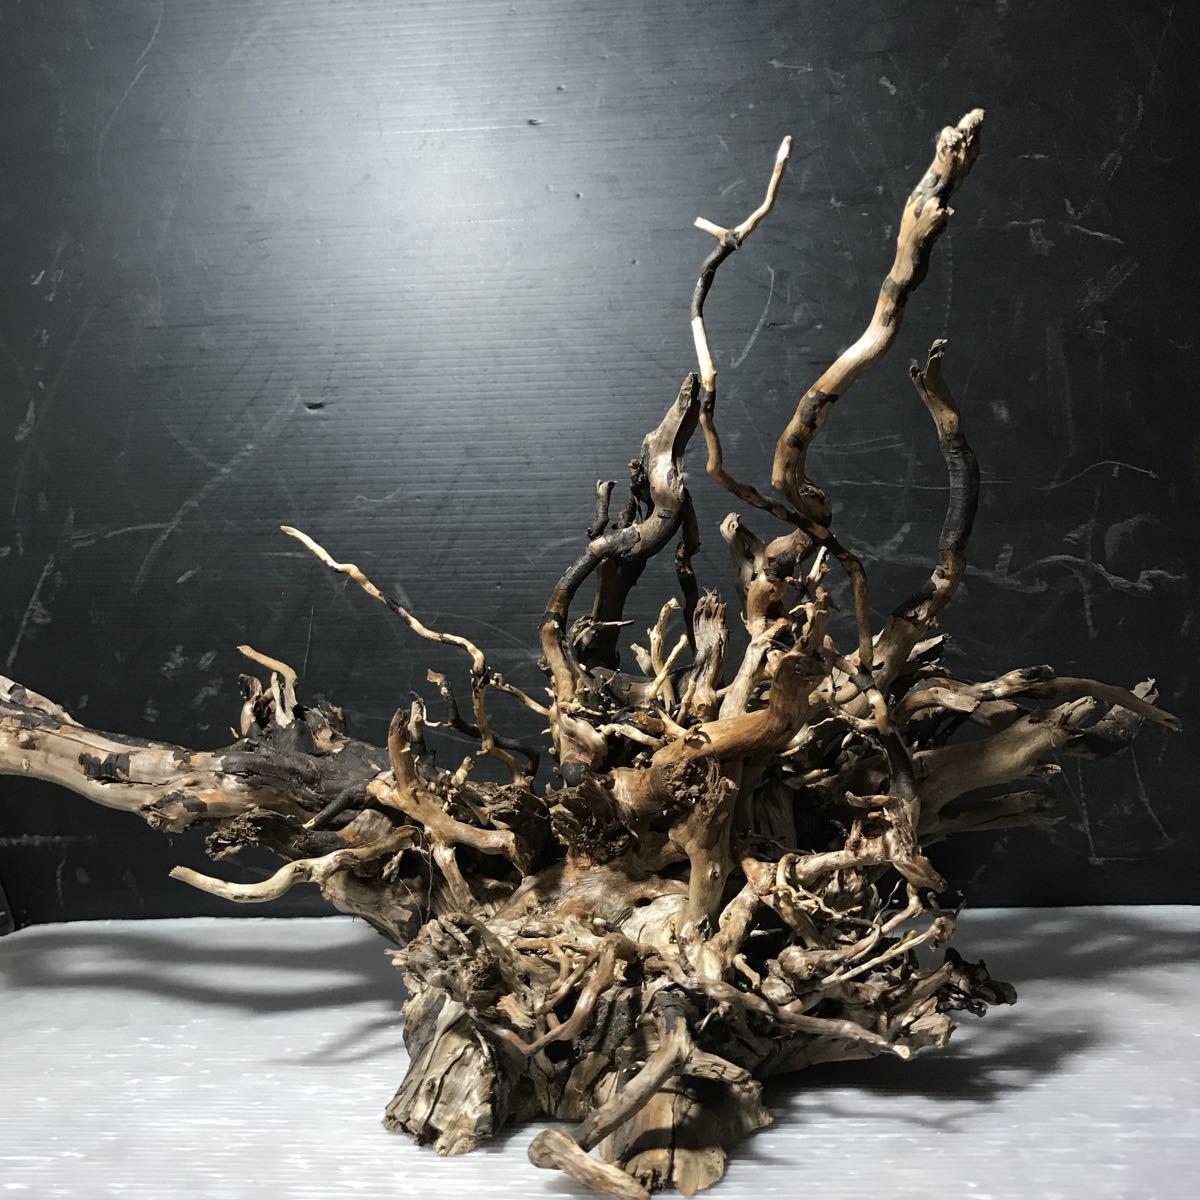 ☆sea tree☆煮沸消毒済み流木 ブランチ流木/水槽/アクアリウム/テラリウム/インテリア/ADA/サンゴ/置物